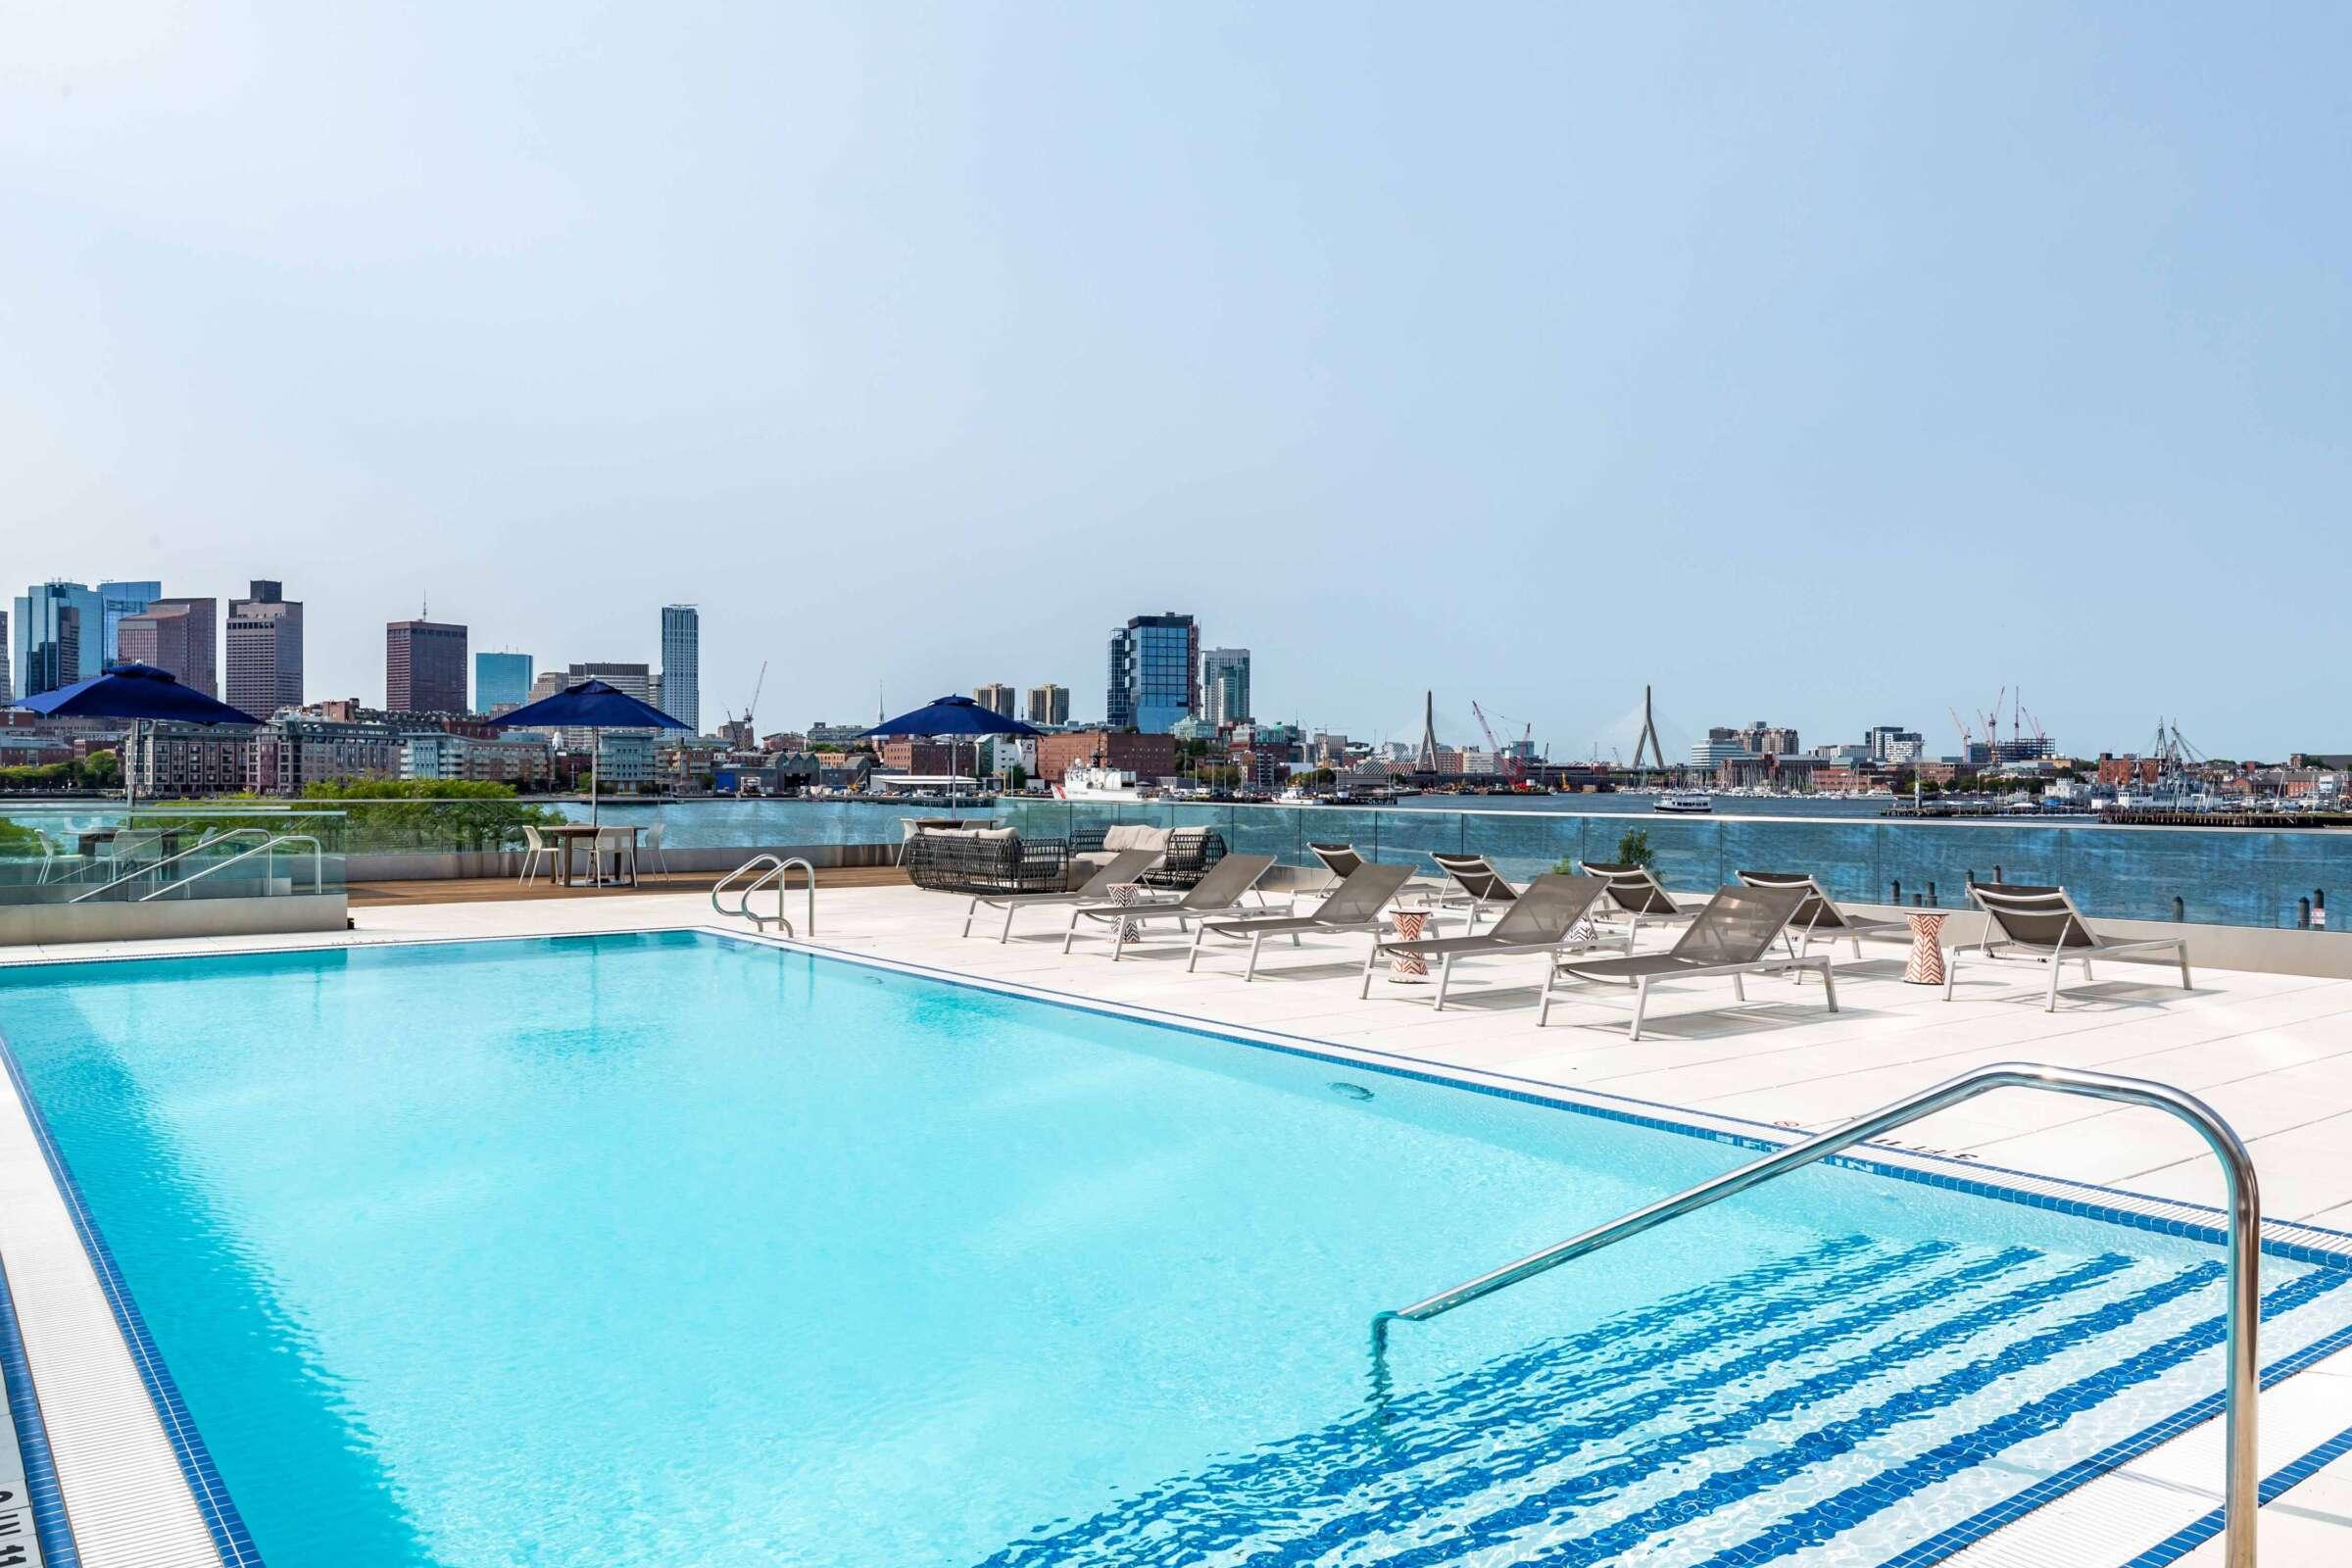 The Eddy East Boston Apartments Amenities 15 pool deck